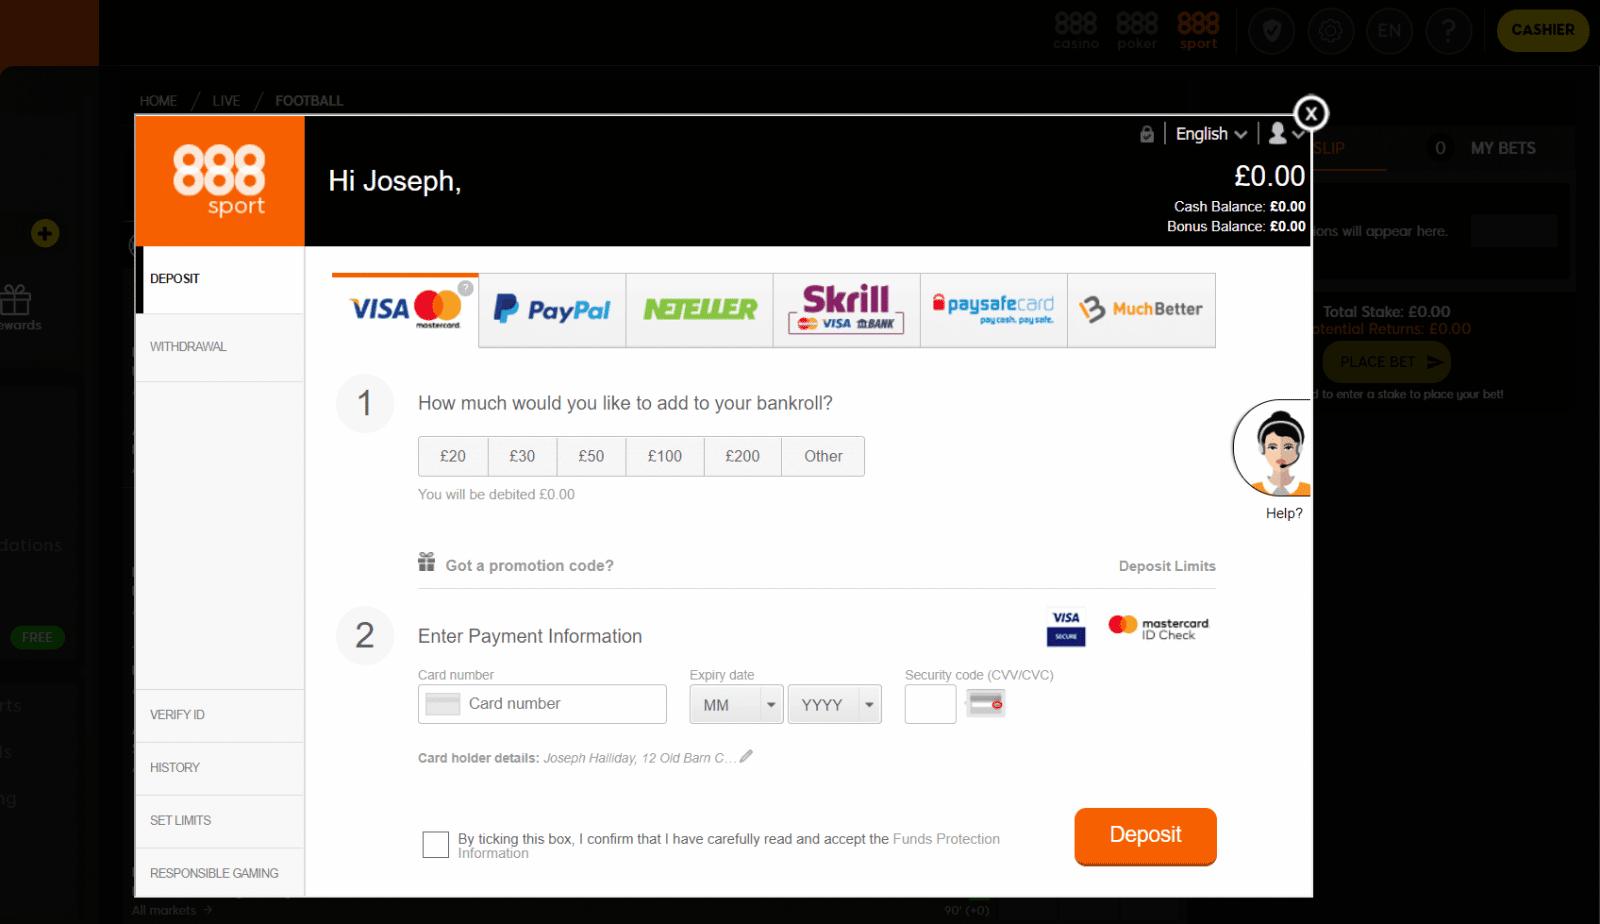 888sport free bet deposit screen